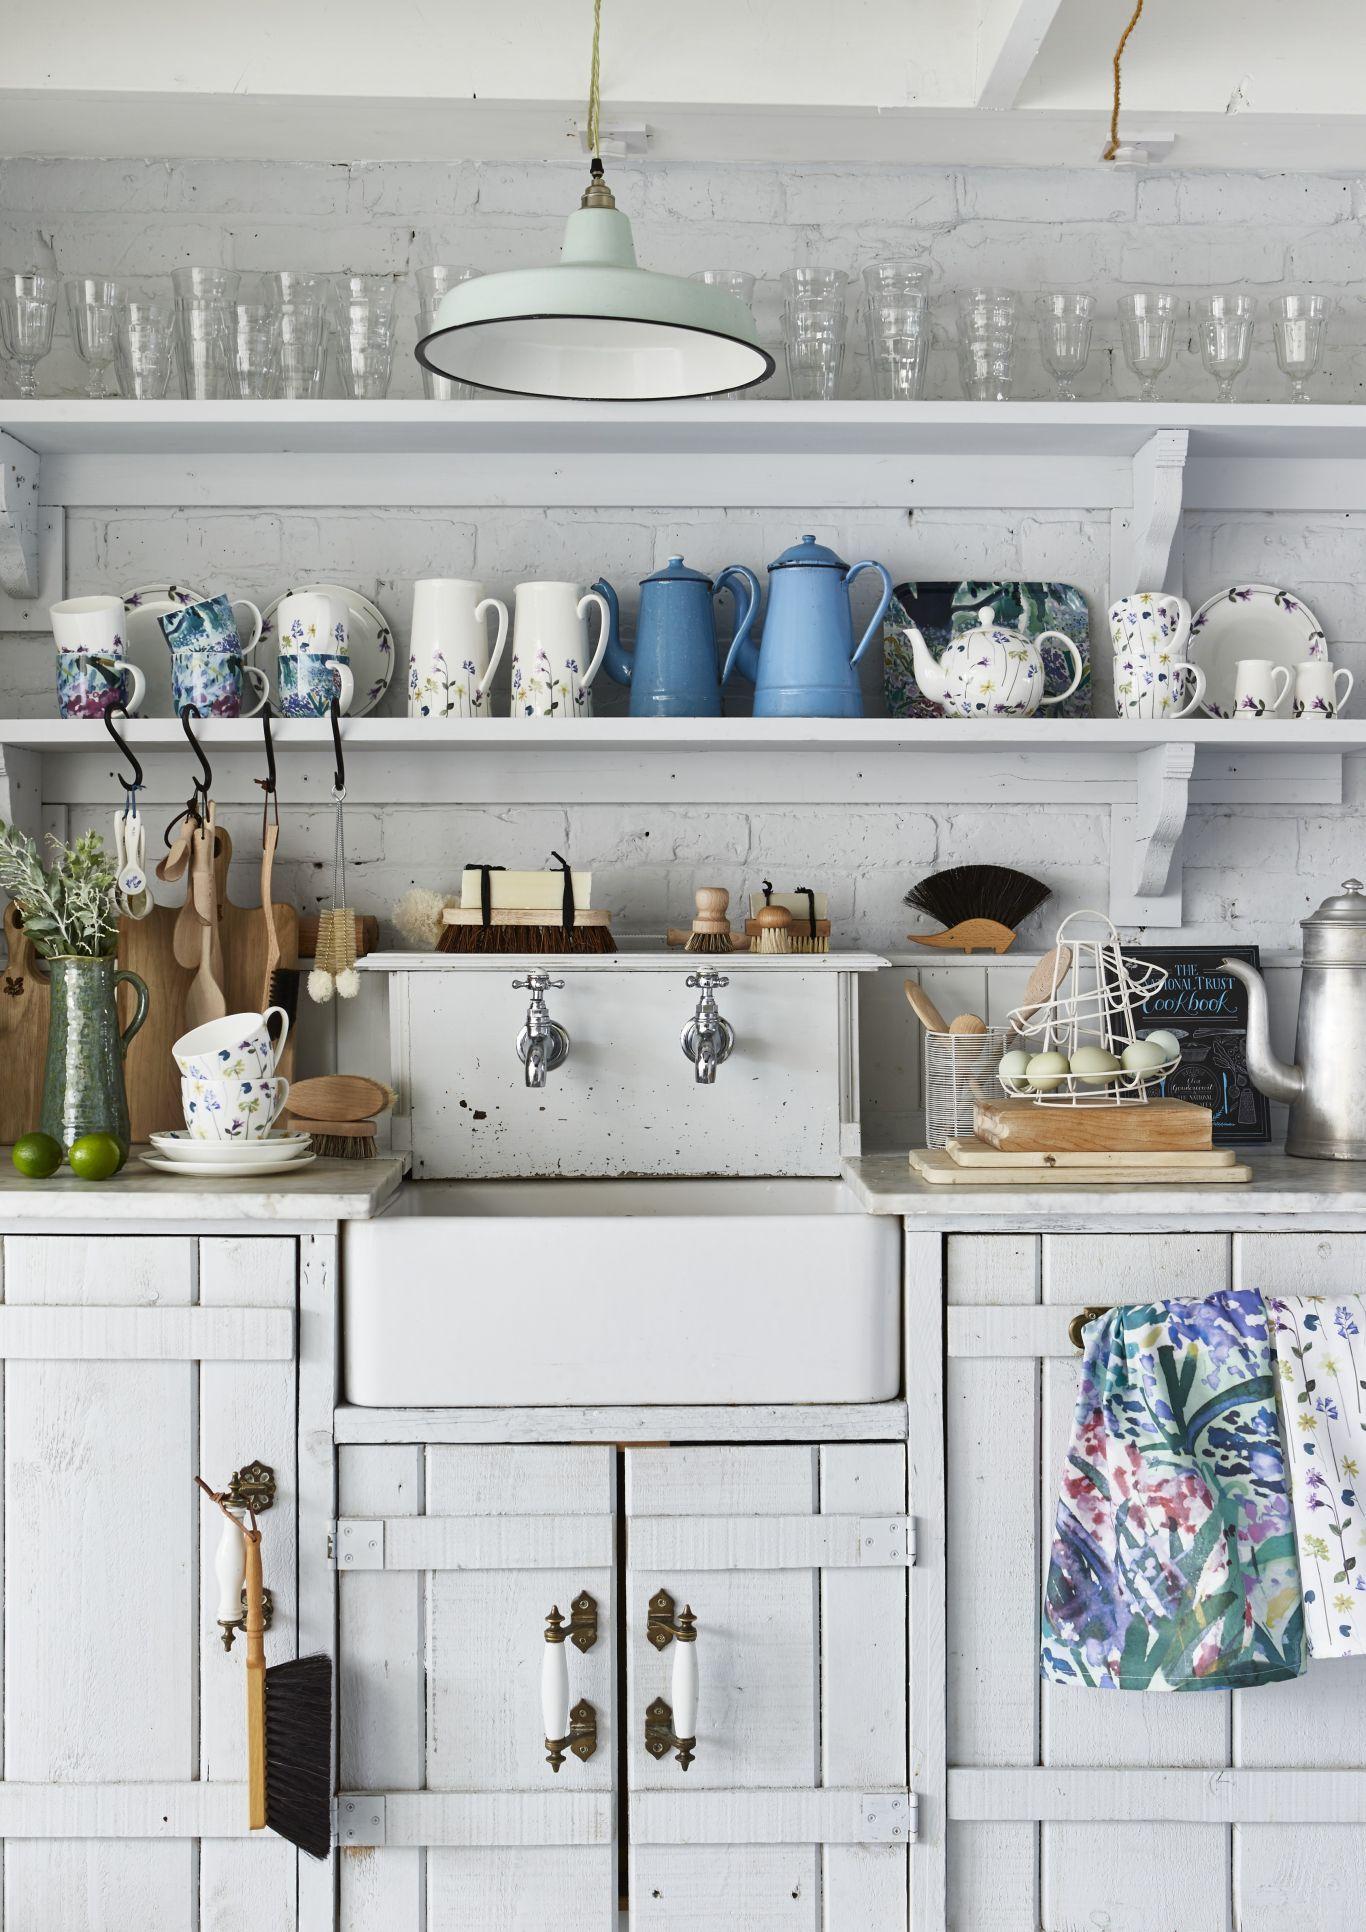 Cucina Stile Vintage.Come Arredare La Cucina In Stile Vintage Kitchen Cucina